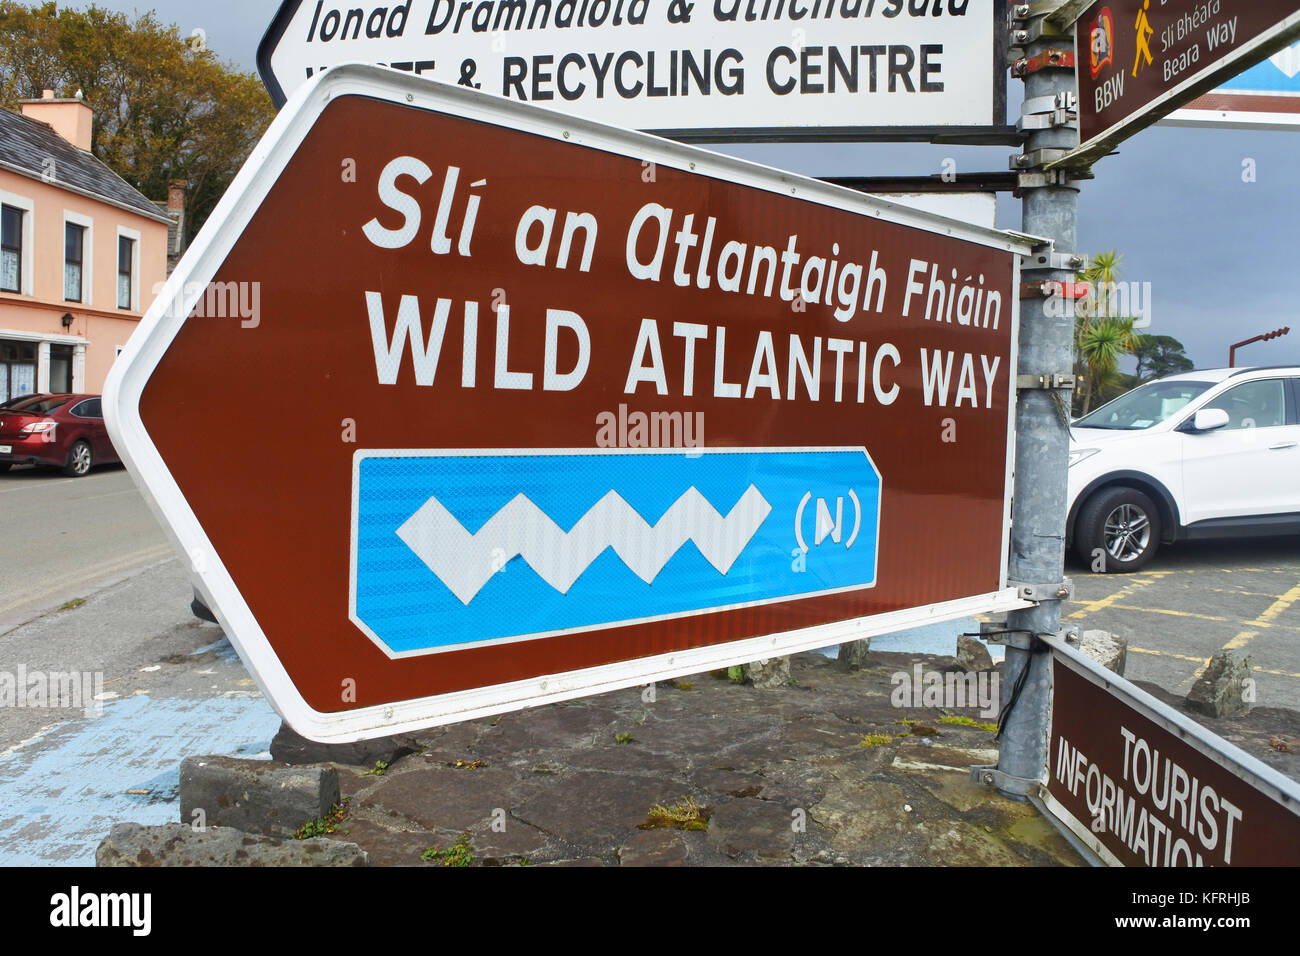 Wild Atlantic Way Signpost, Castletownbere, County Cork, Ireland - John Gollop - Stock Image